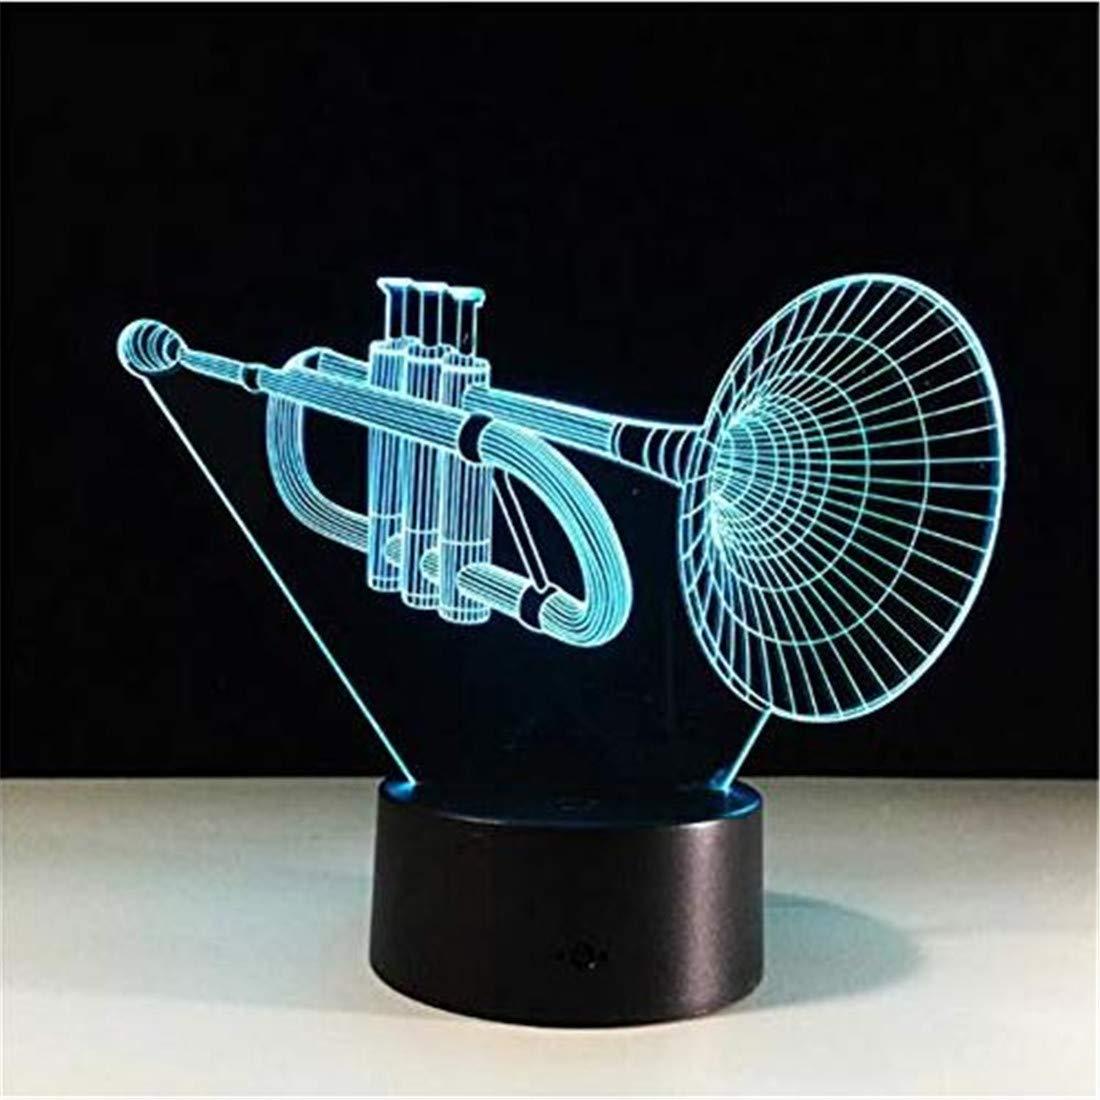 Led Holograma 3d Lámpara Instrumentos Musicales Diseño De Saxofón LpqzjUSMVG